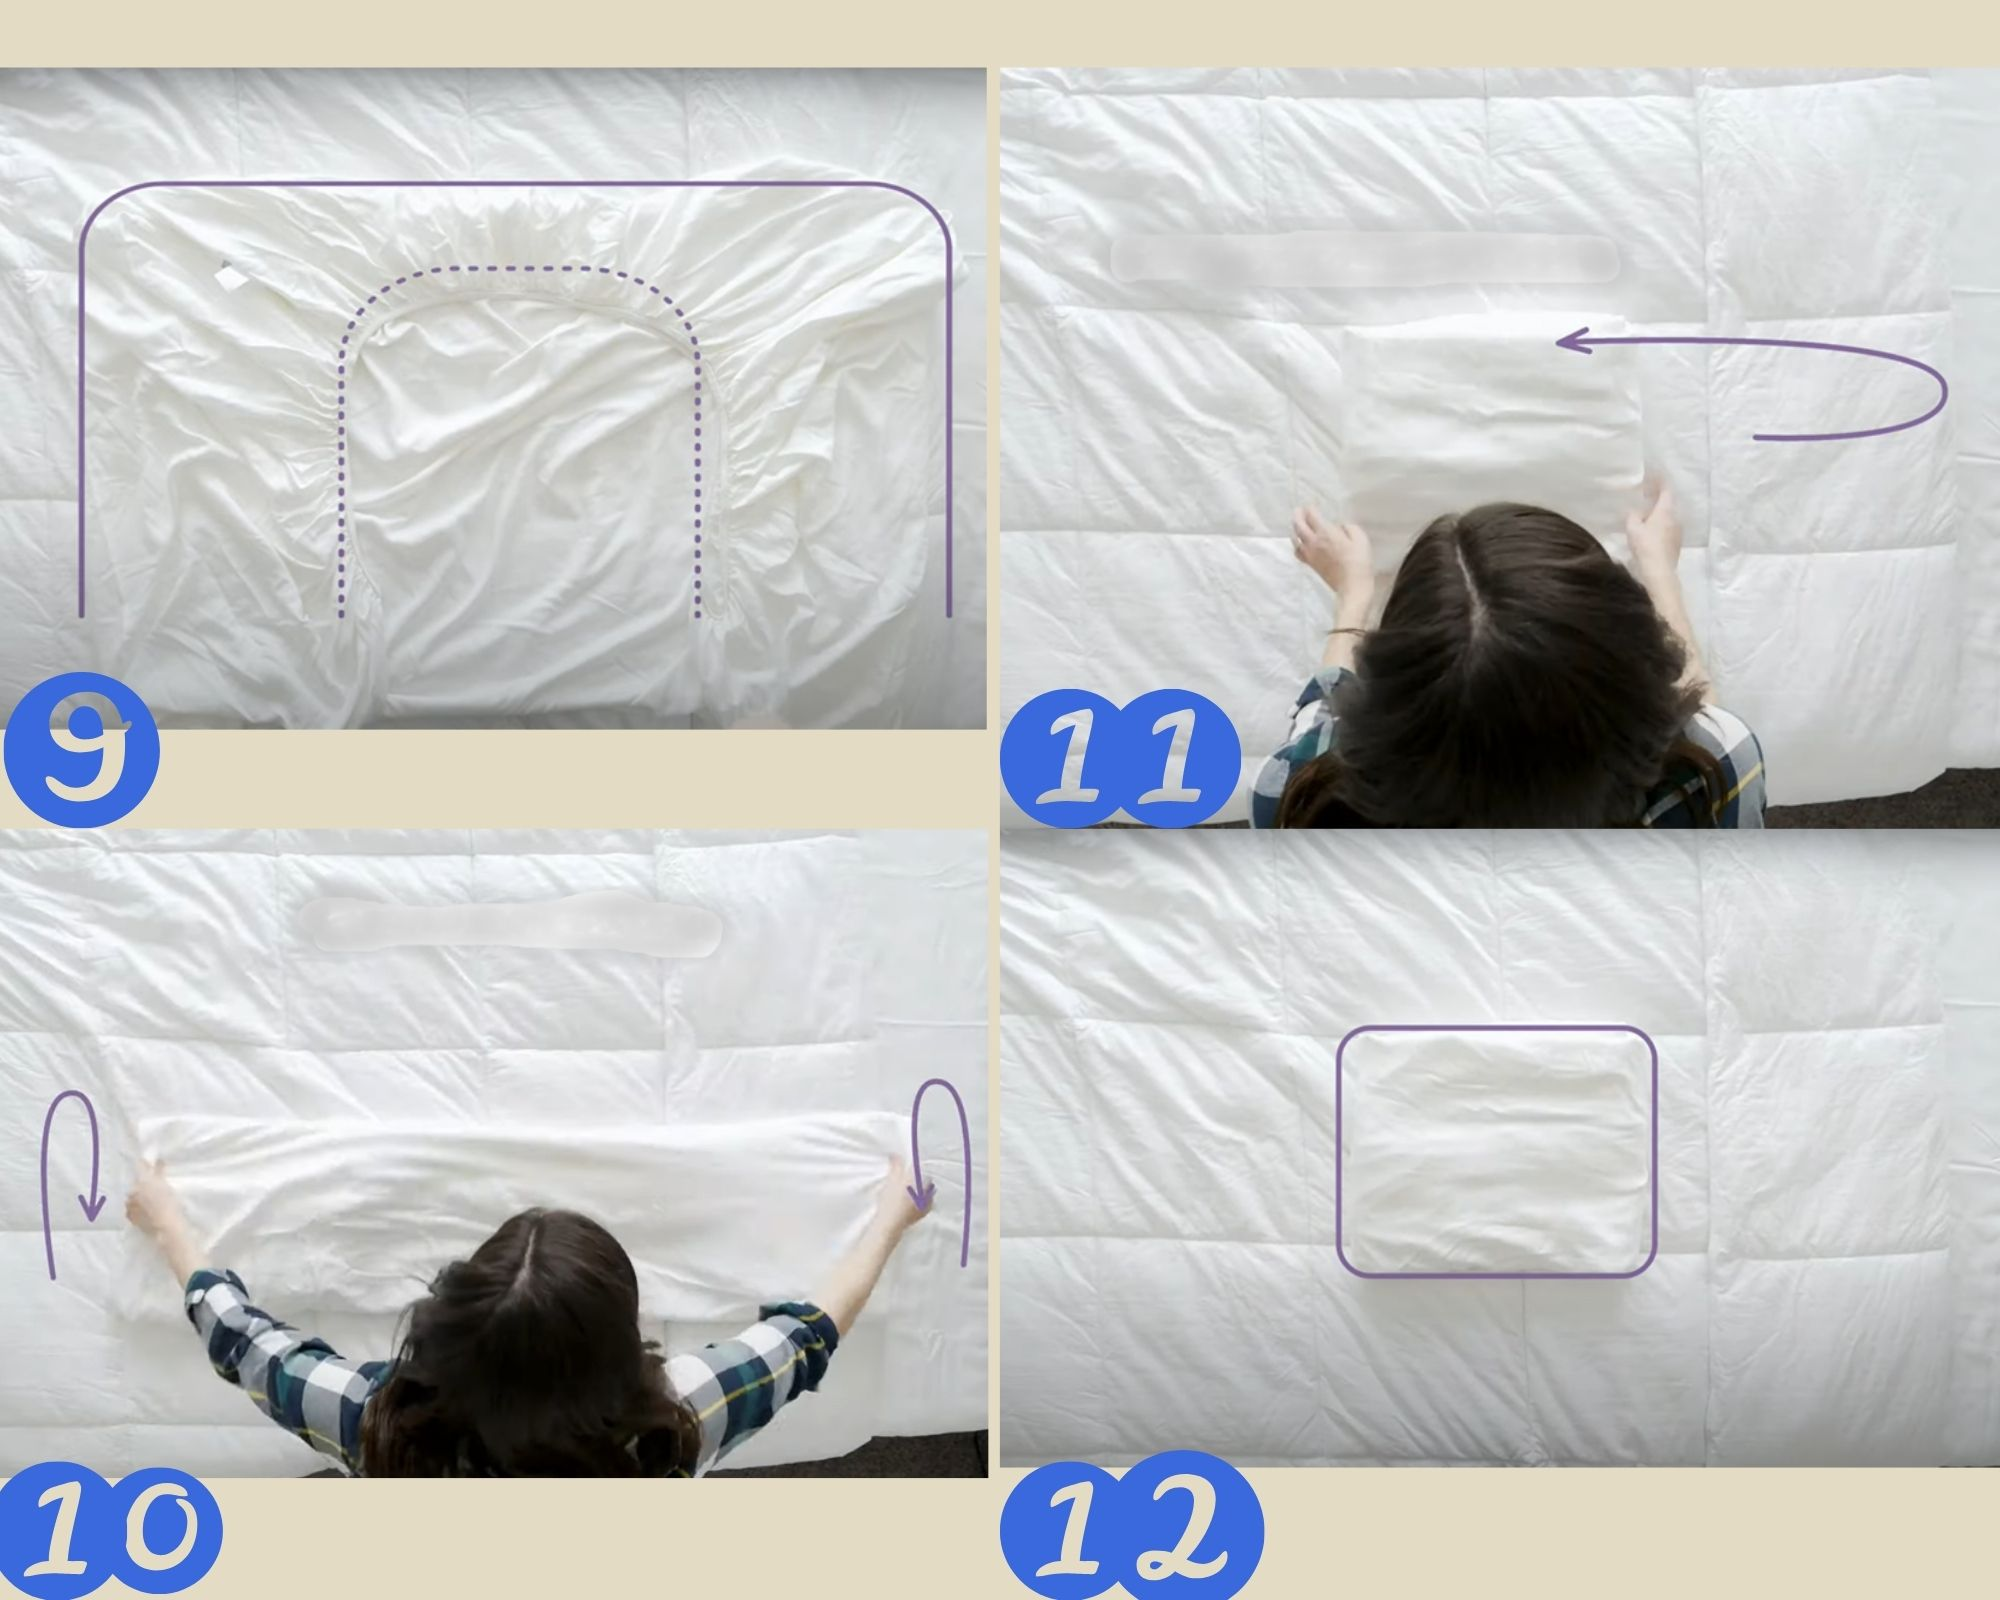 9 -12 этапы складывания простыни